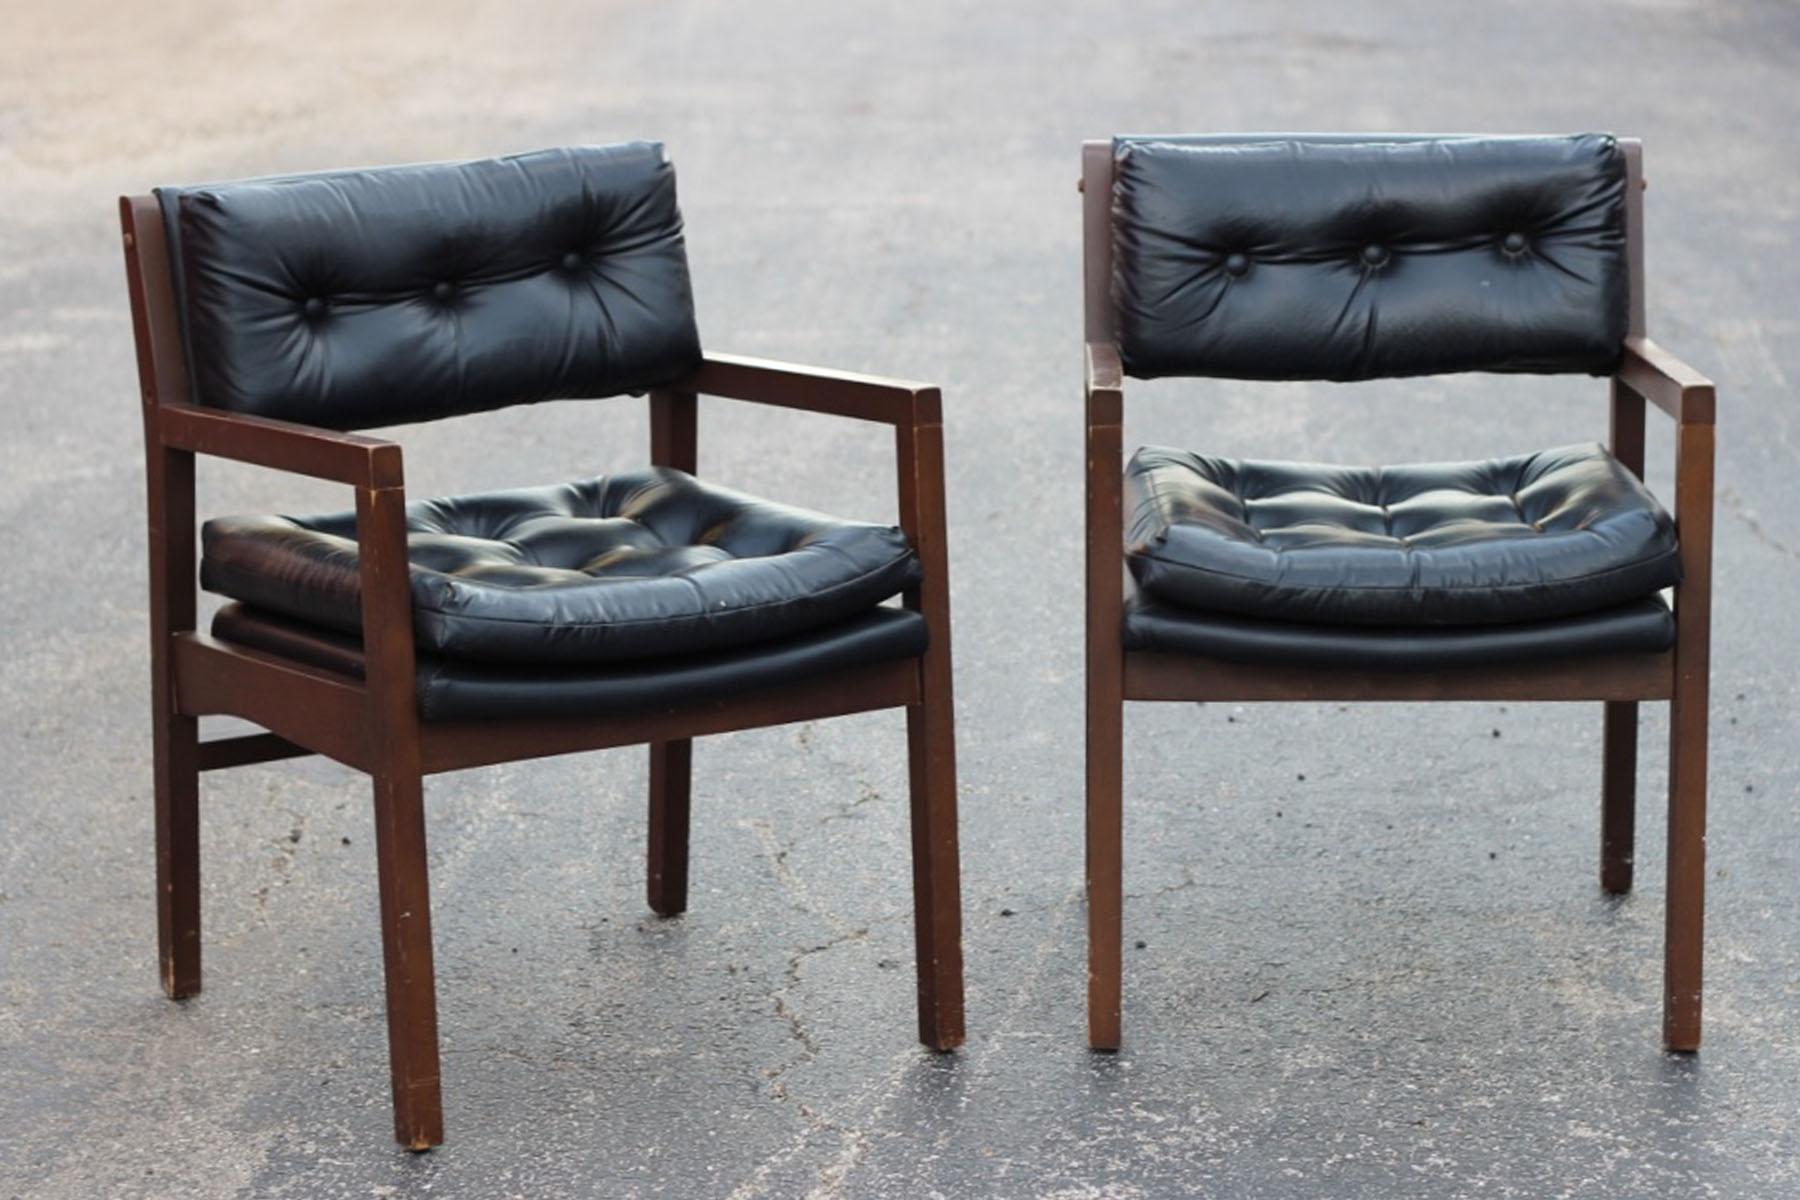 Wyatt Chairs - Tulsa Wedding Rentals